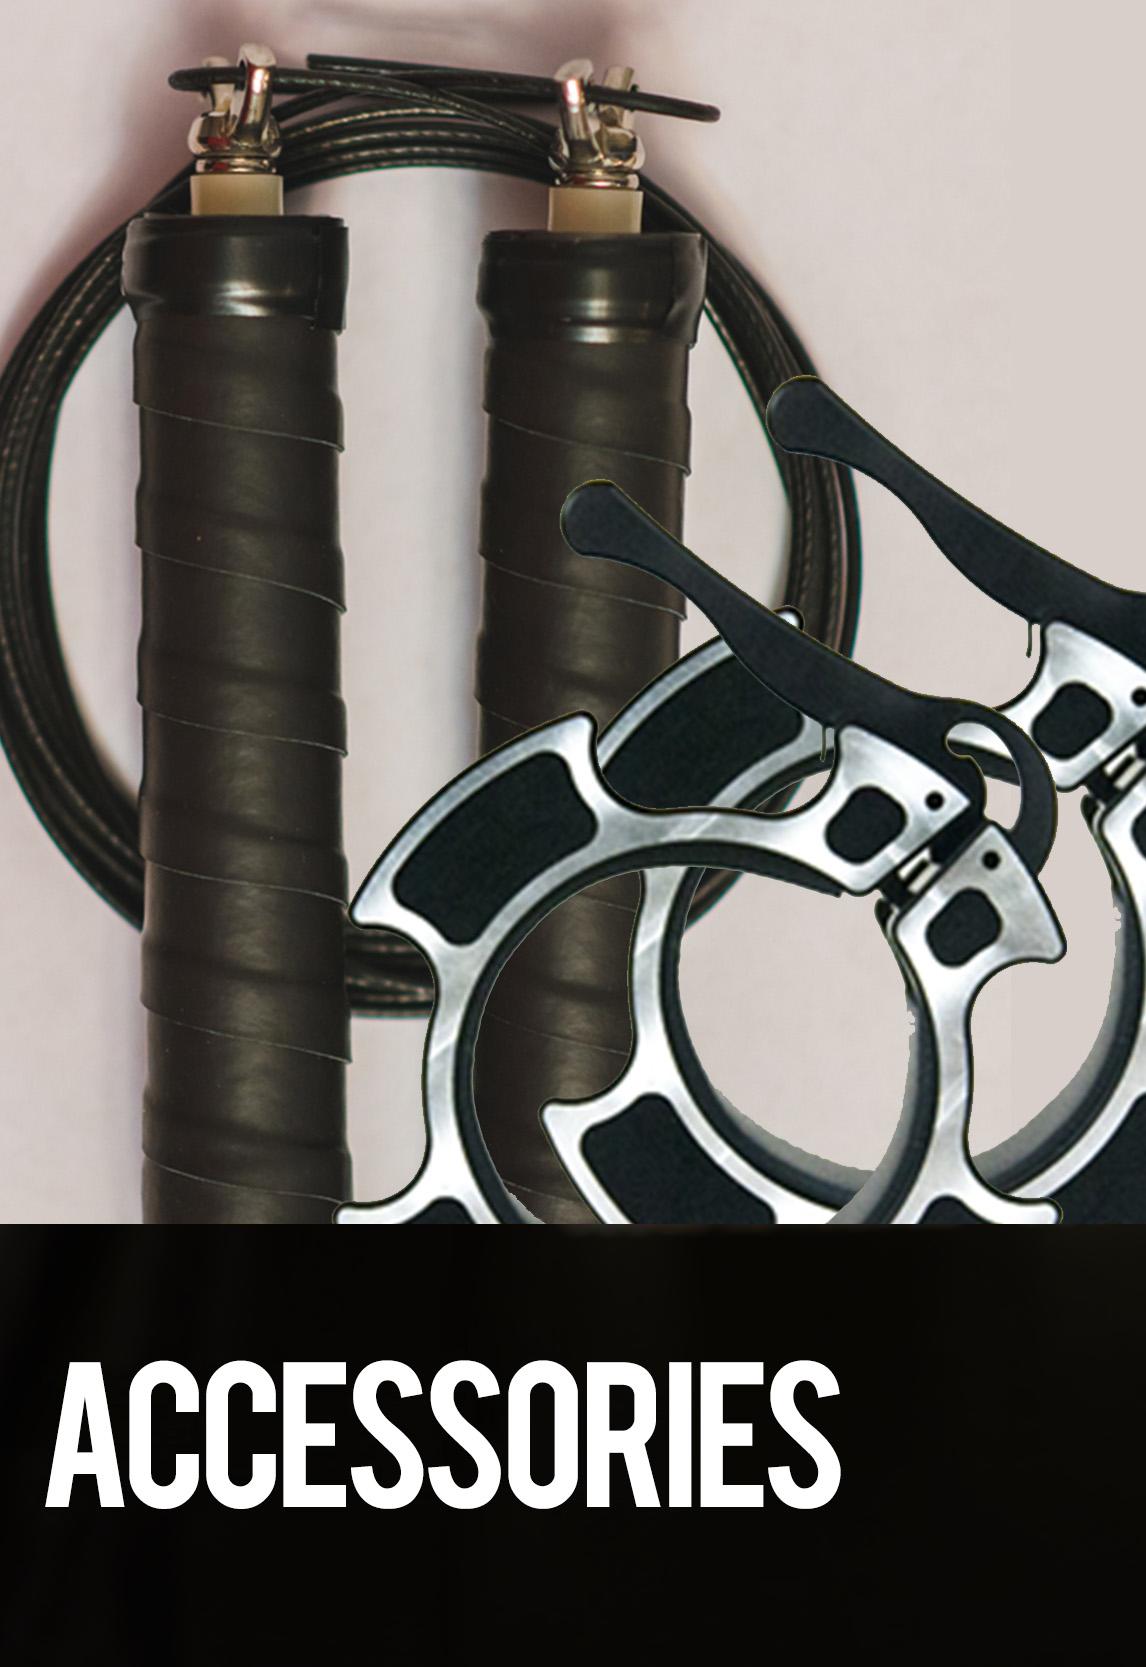 accessoriesrevised